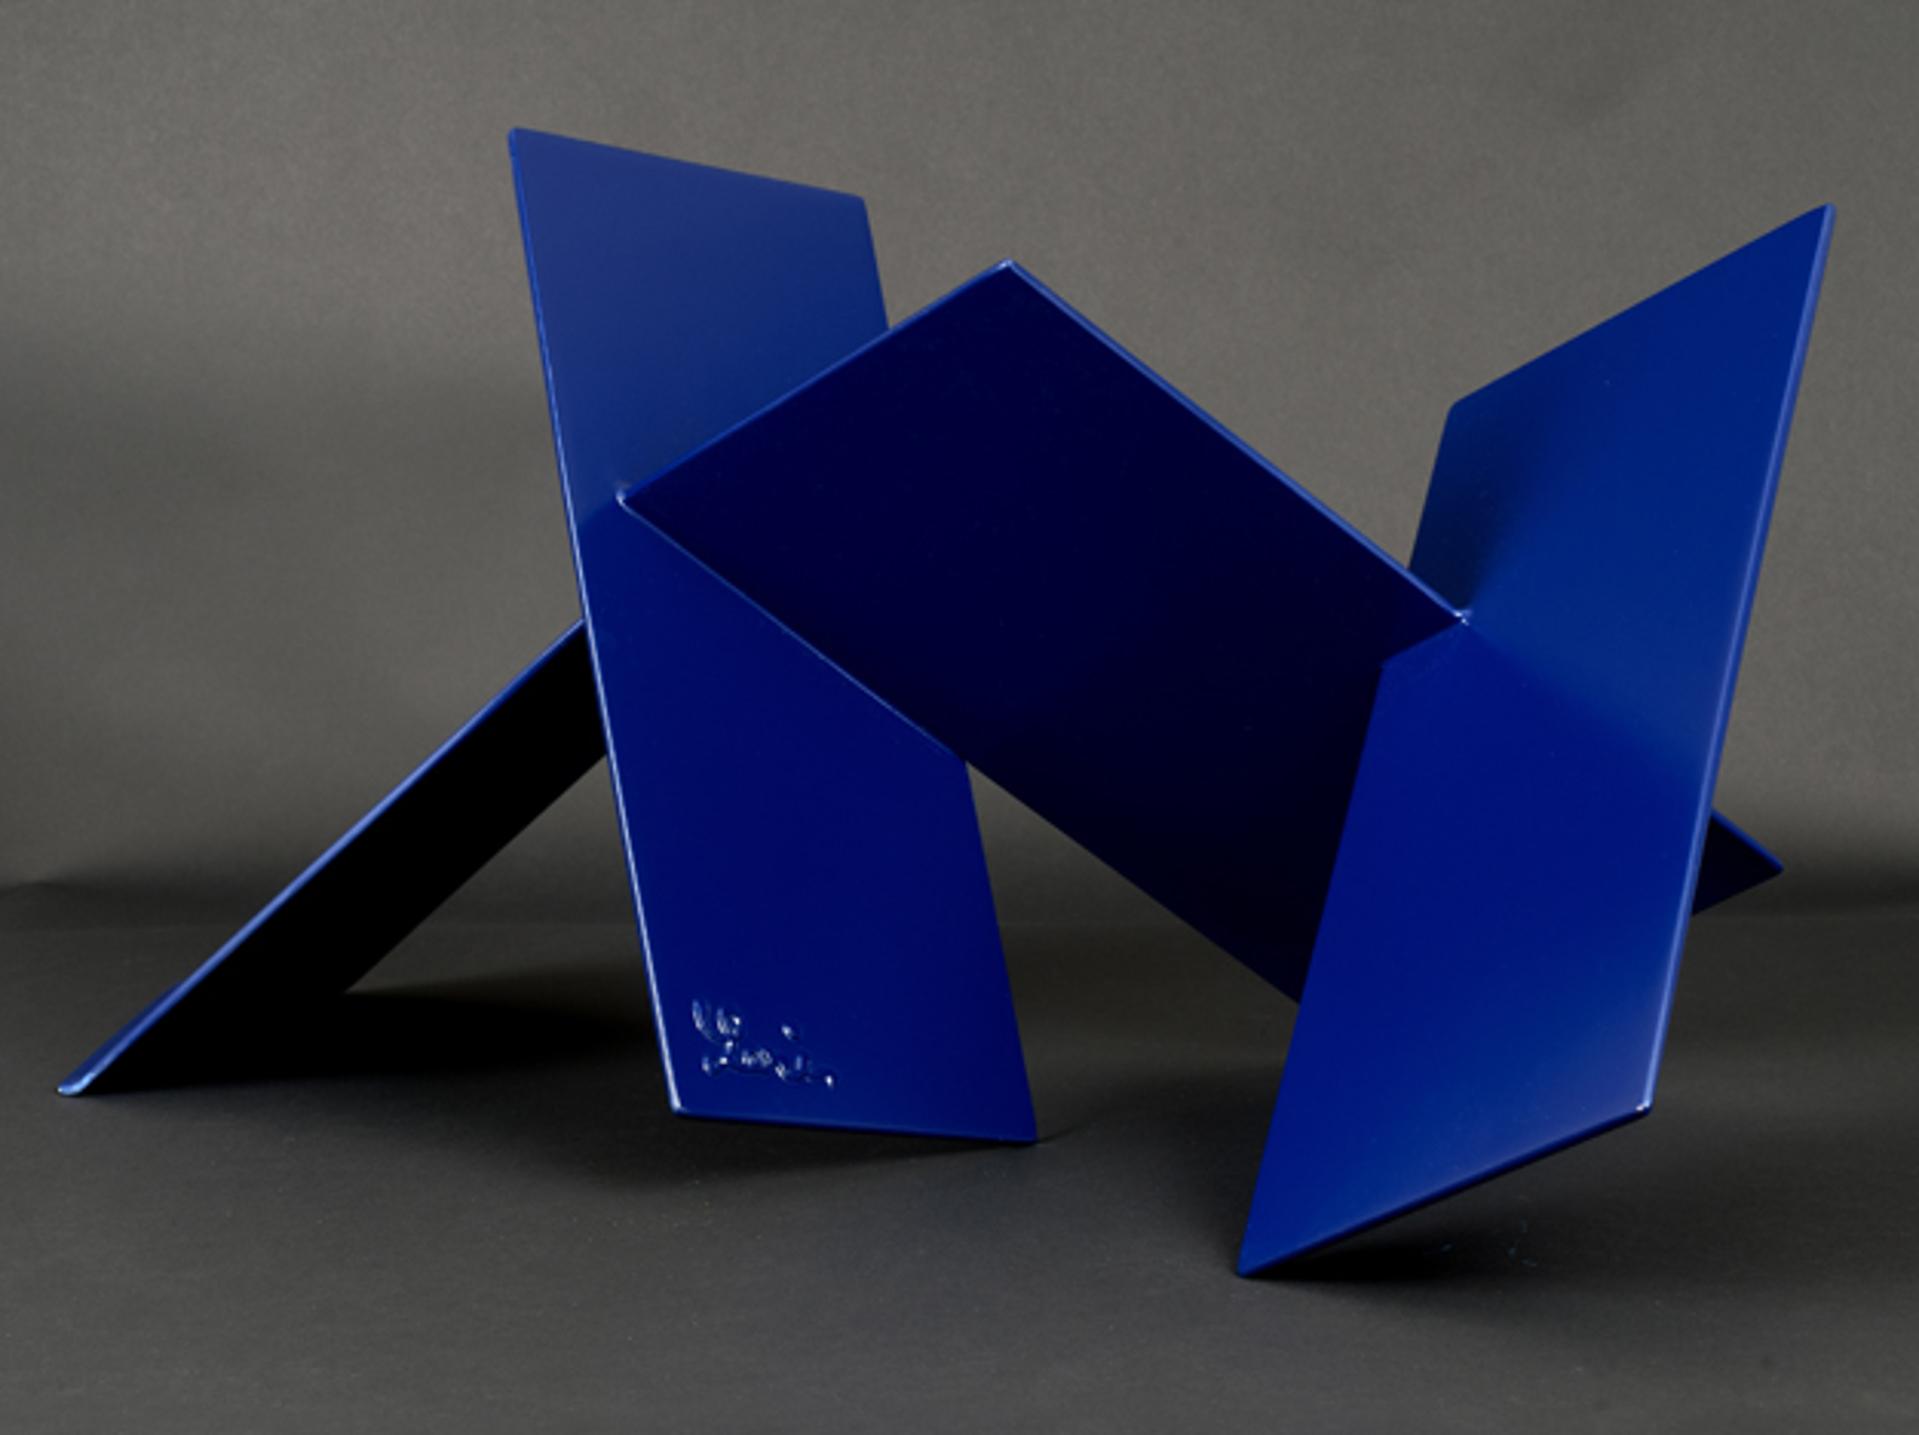 Blue by Dennis Leri